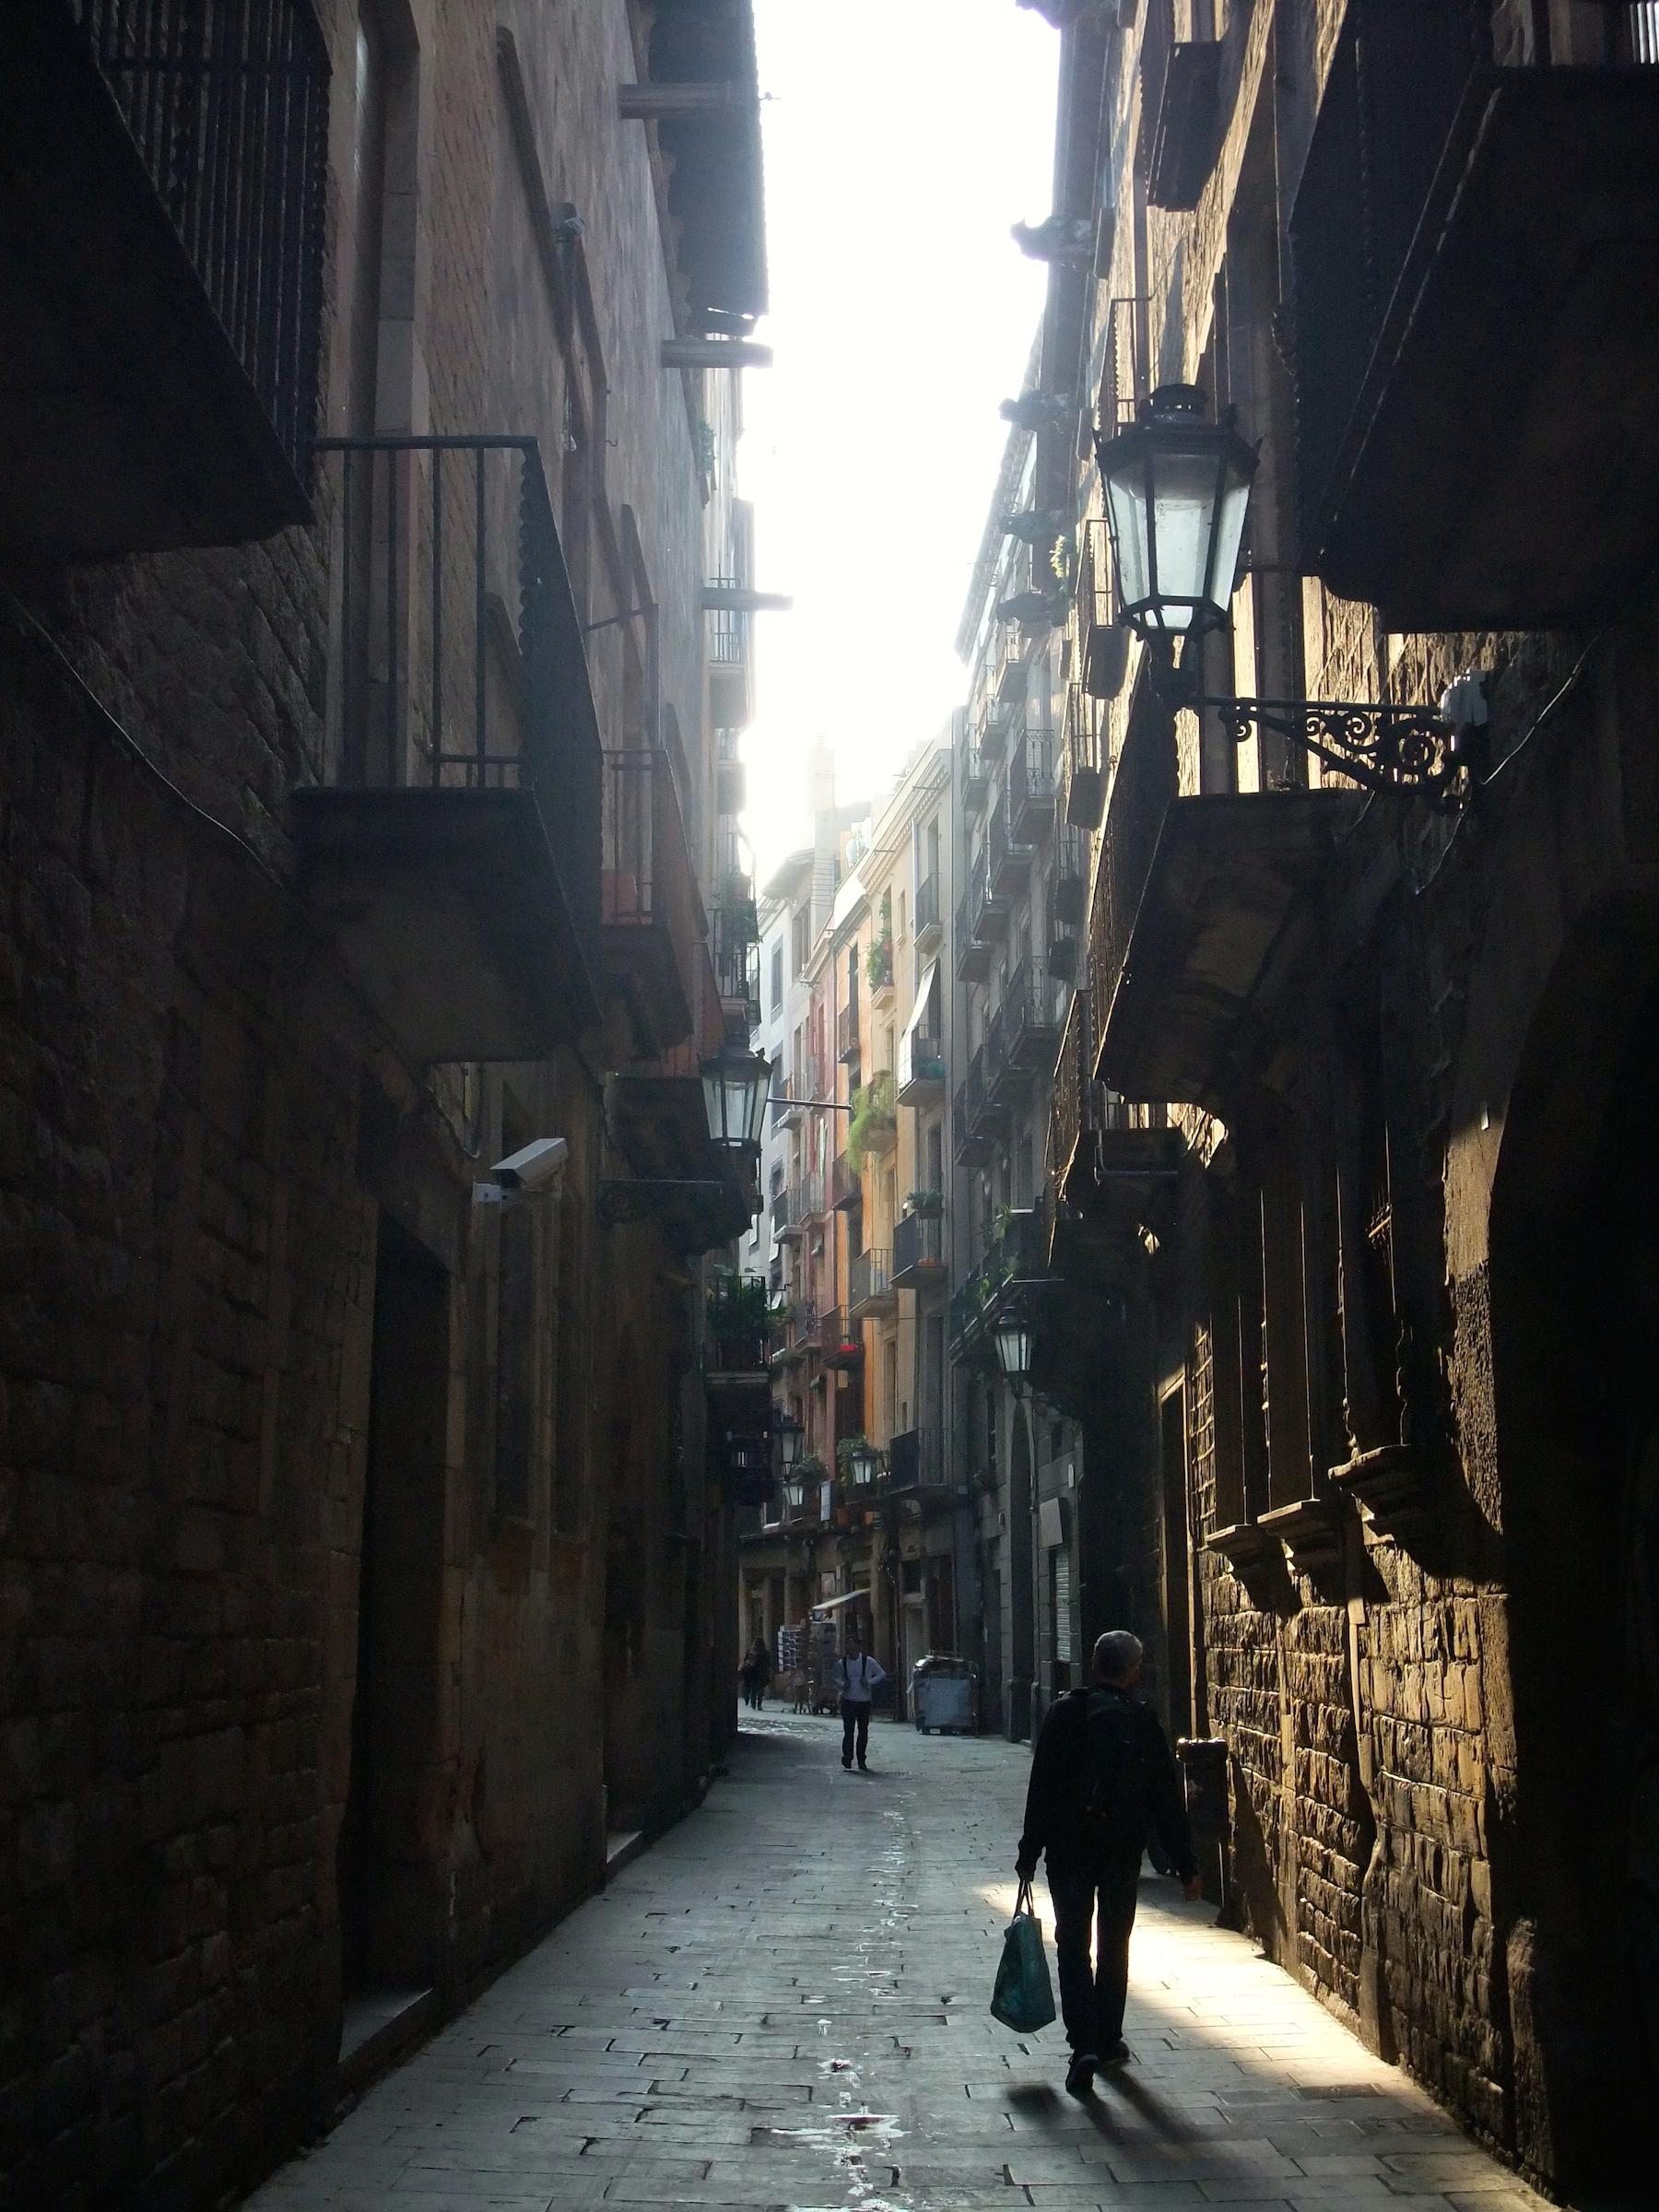 A morning stroll through the Gothic Quarter